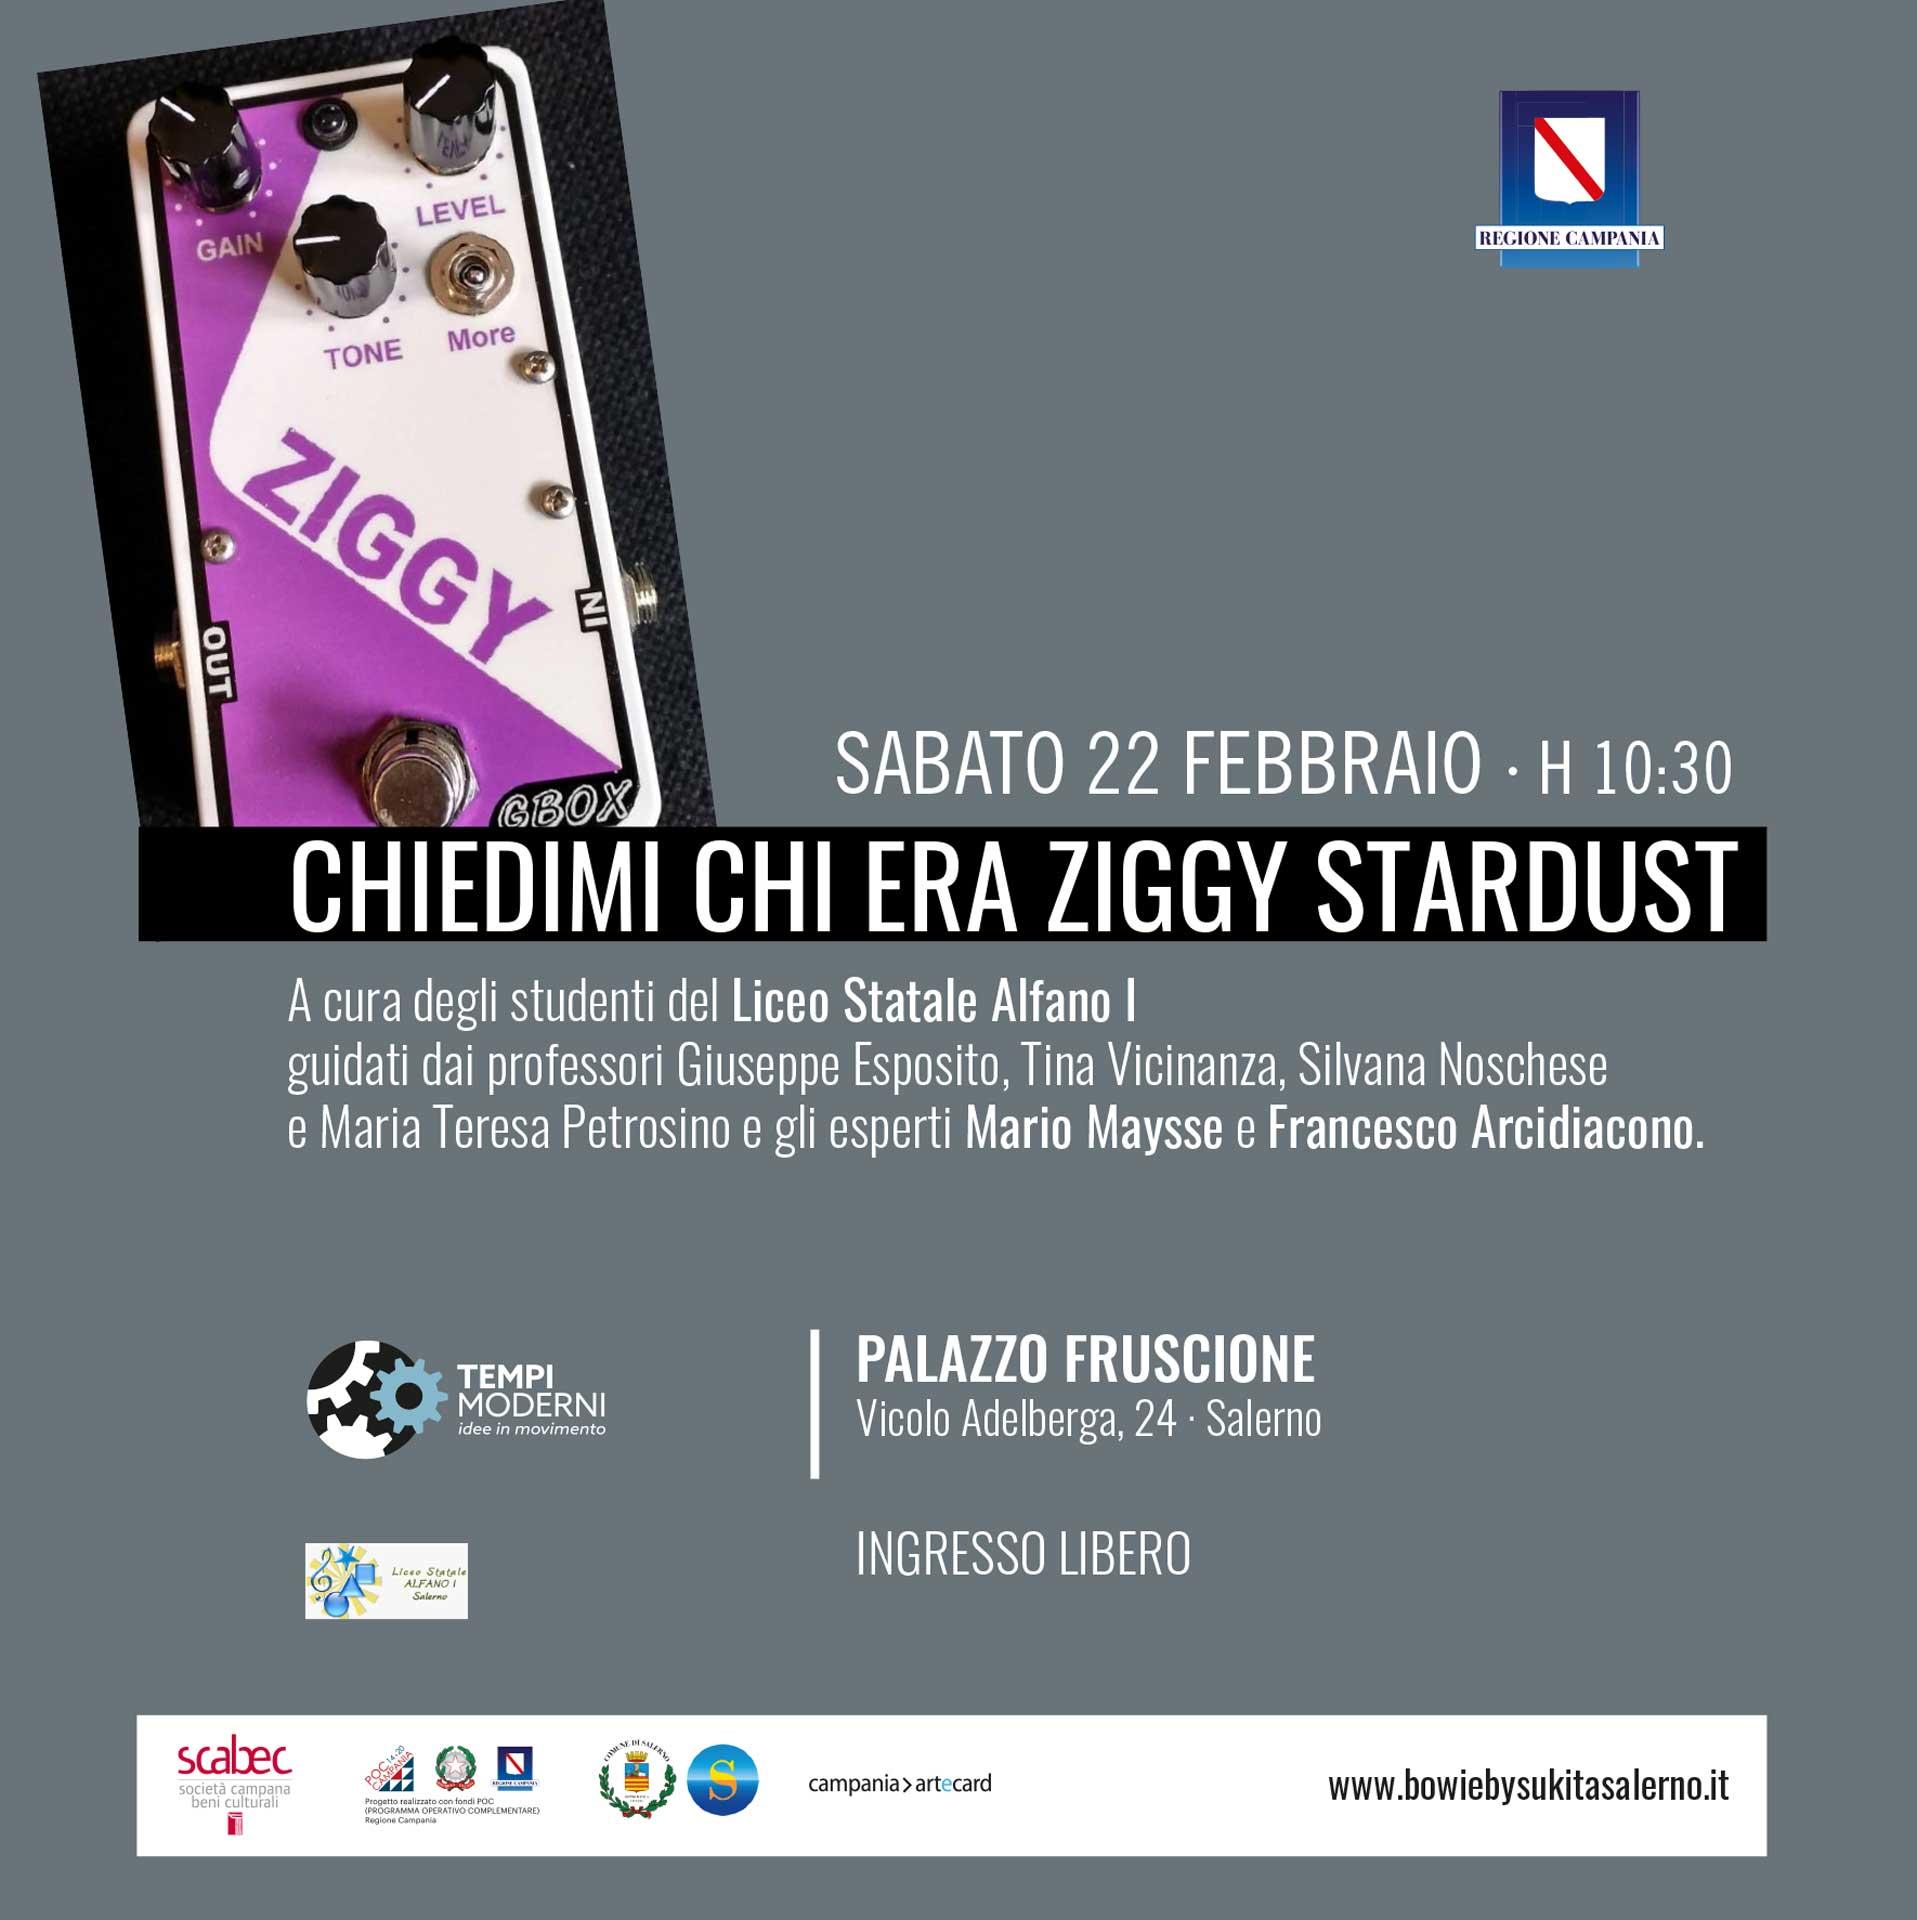 Cover 22 Febbraio 2020 Chiedimi chi era Ziggy Stardust